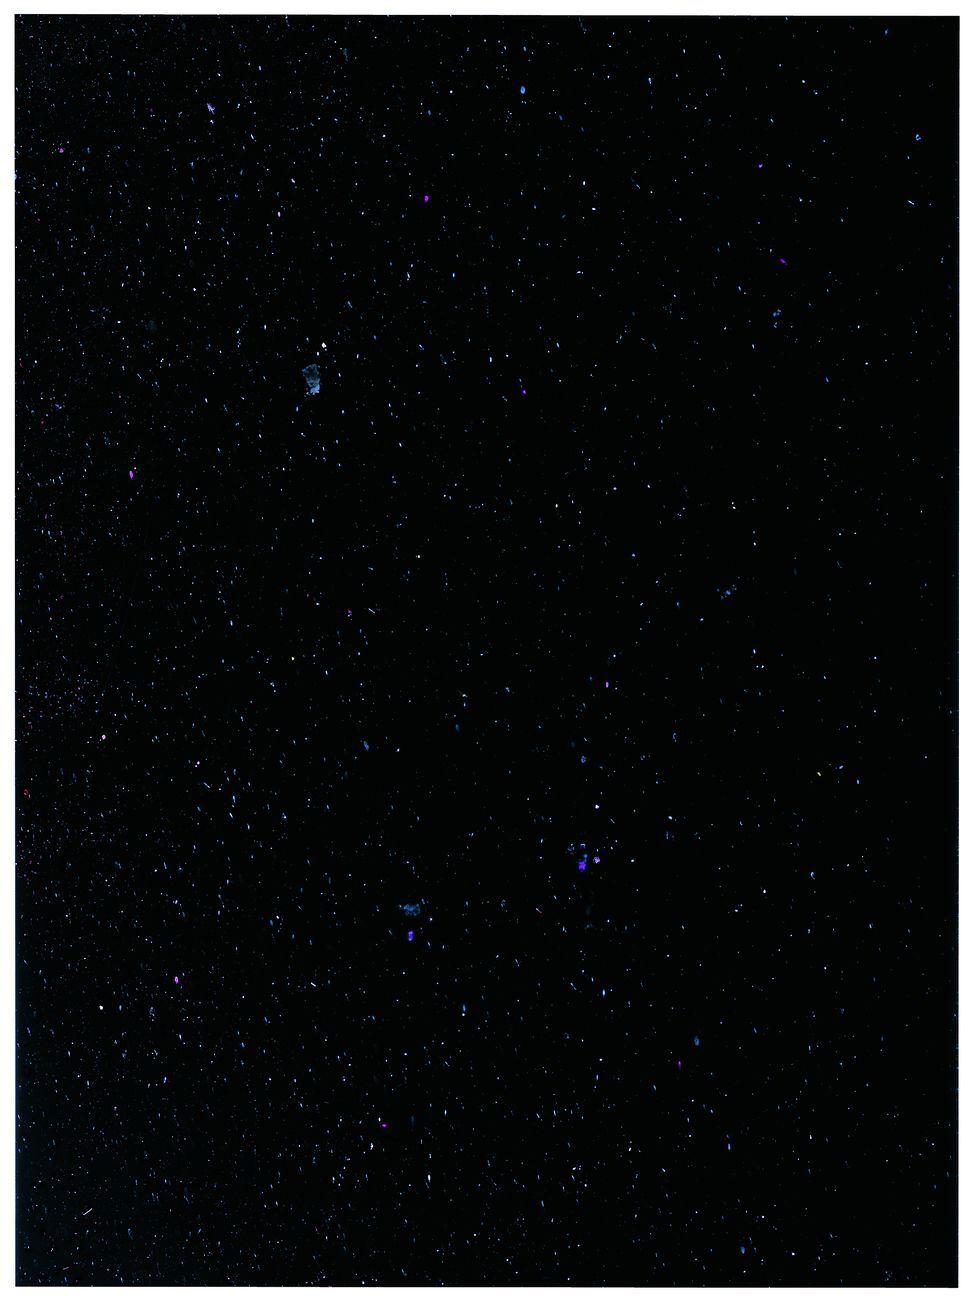 Joan Fontcuberta, MN 3. Canes Venaciti (NGC 5272), dalla serie Constelaciones, 1993